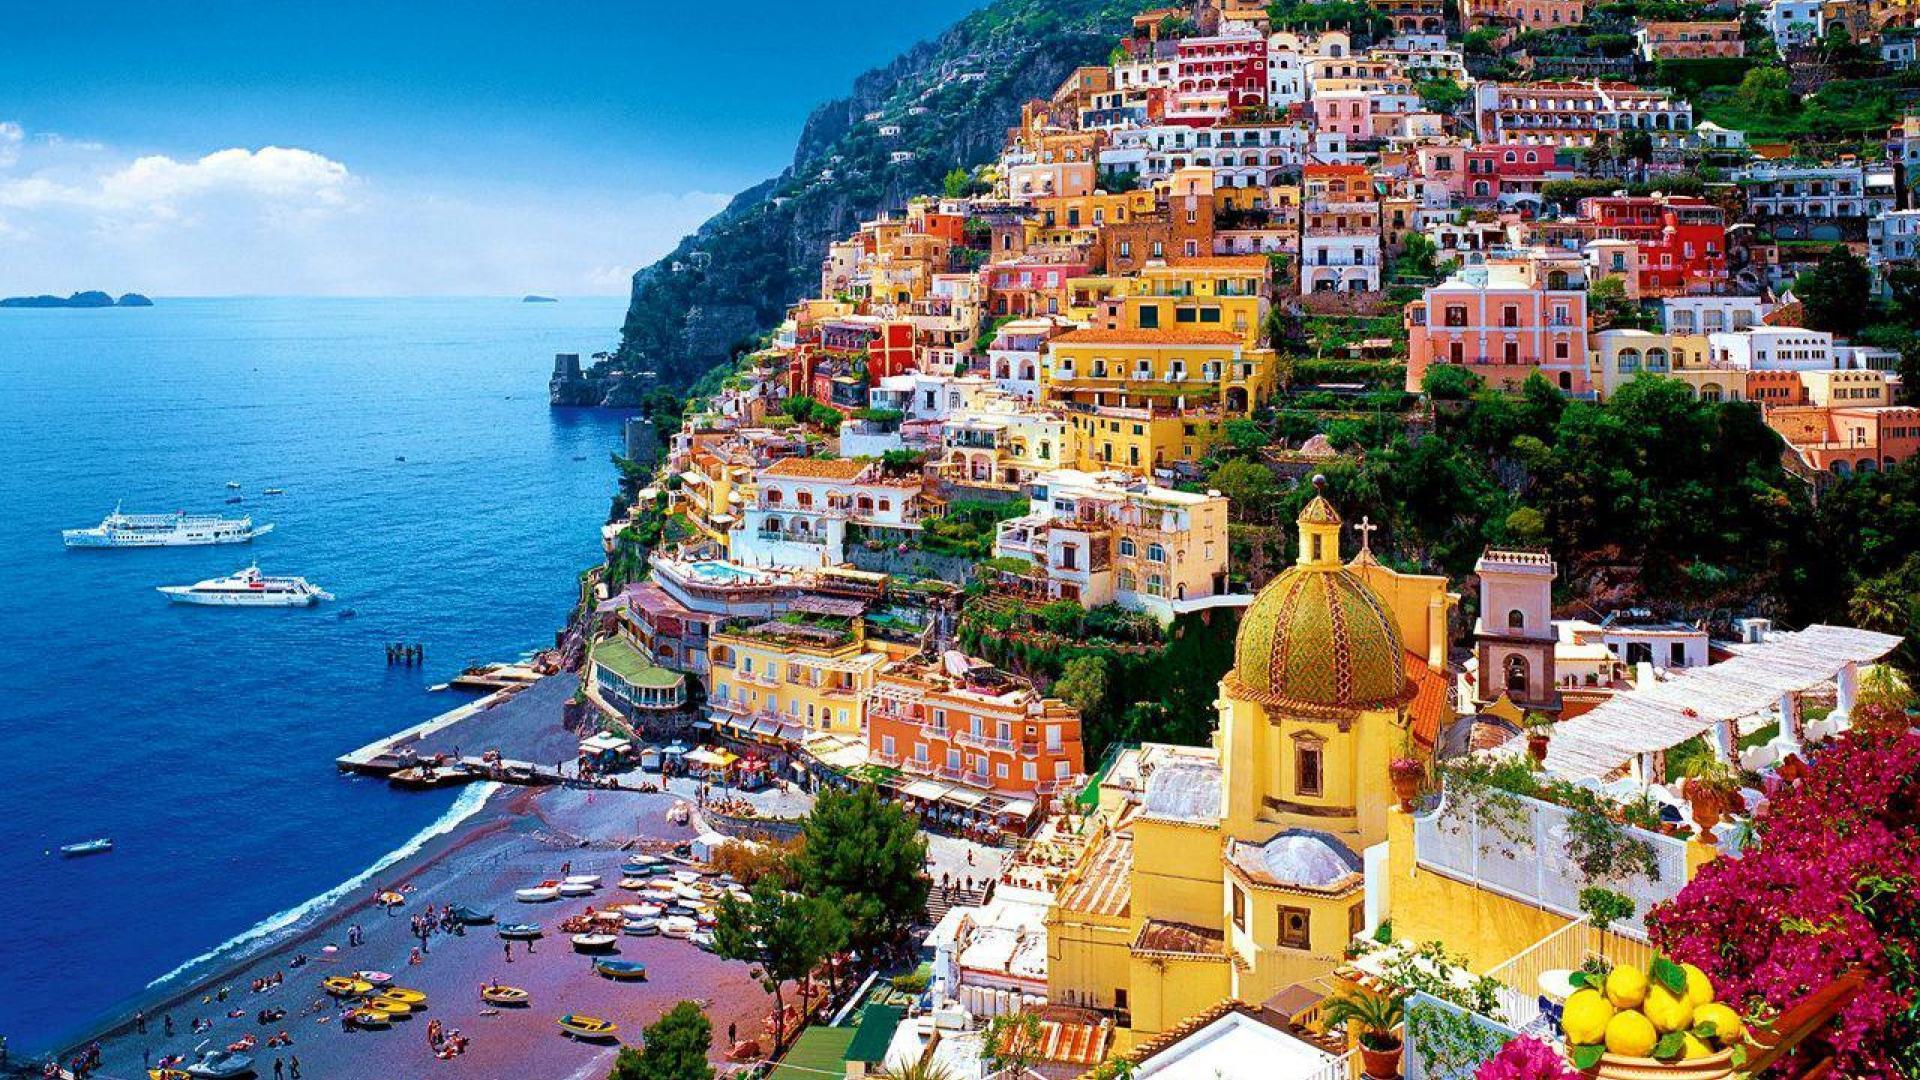 positano_amalfi_coast_italy-1557604